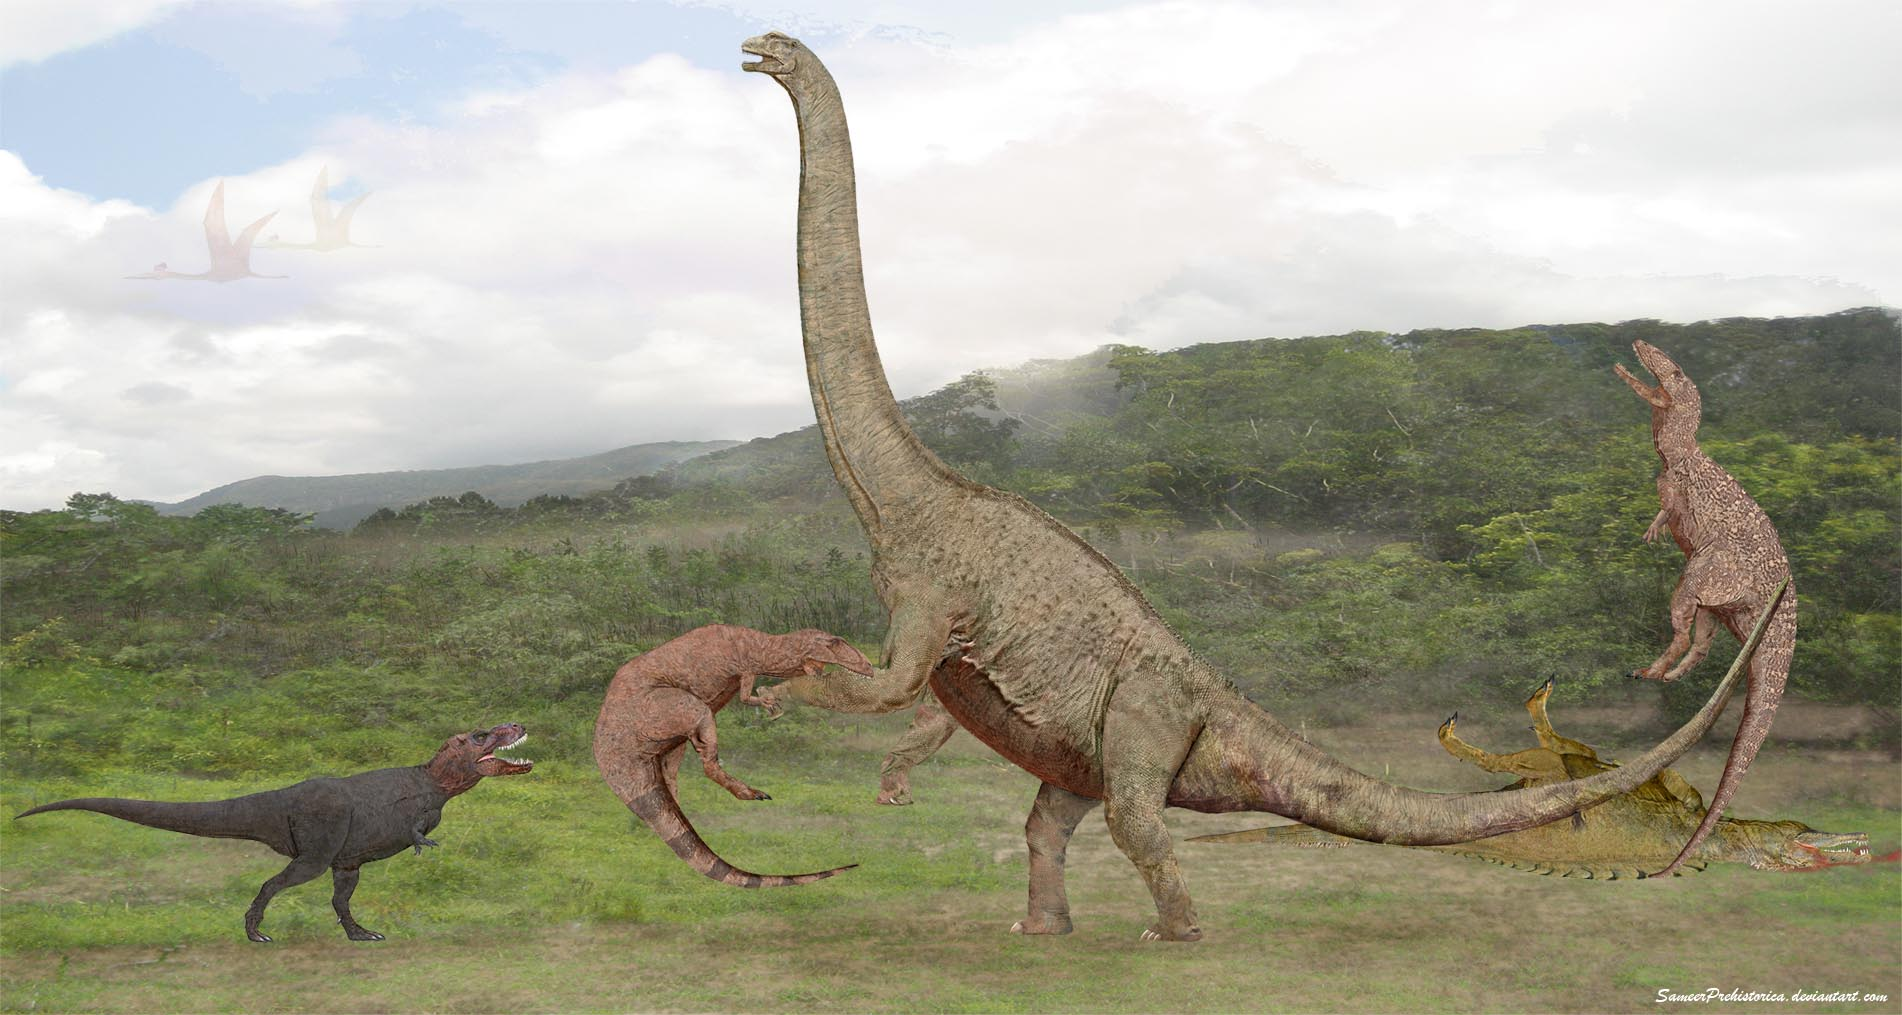 Argentinosaurus Vs Theropods | Dinosaur Home